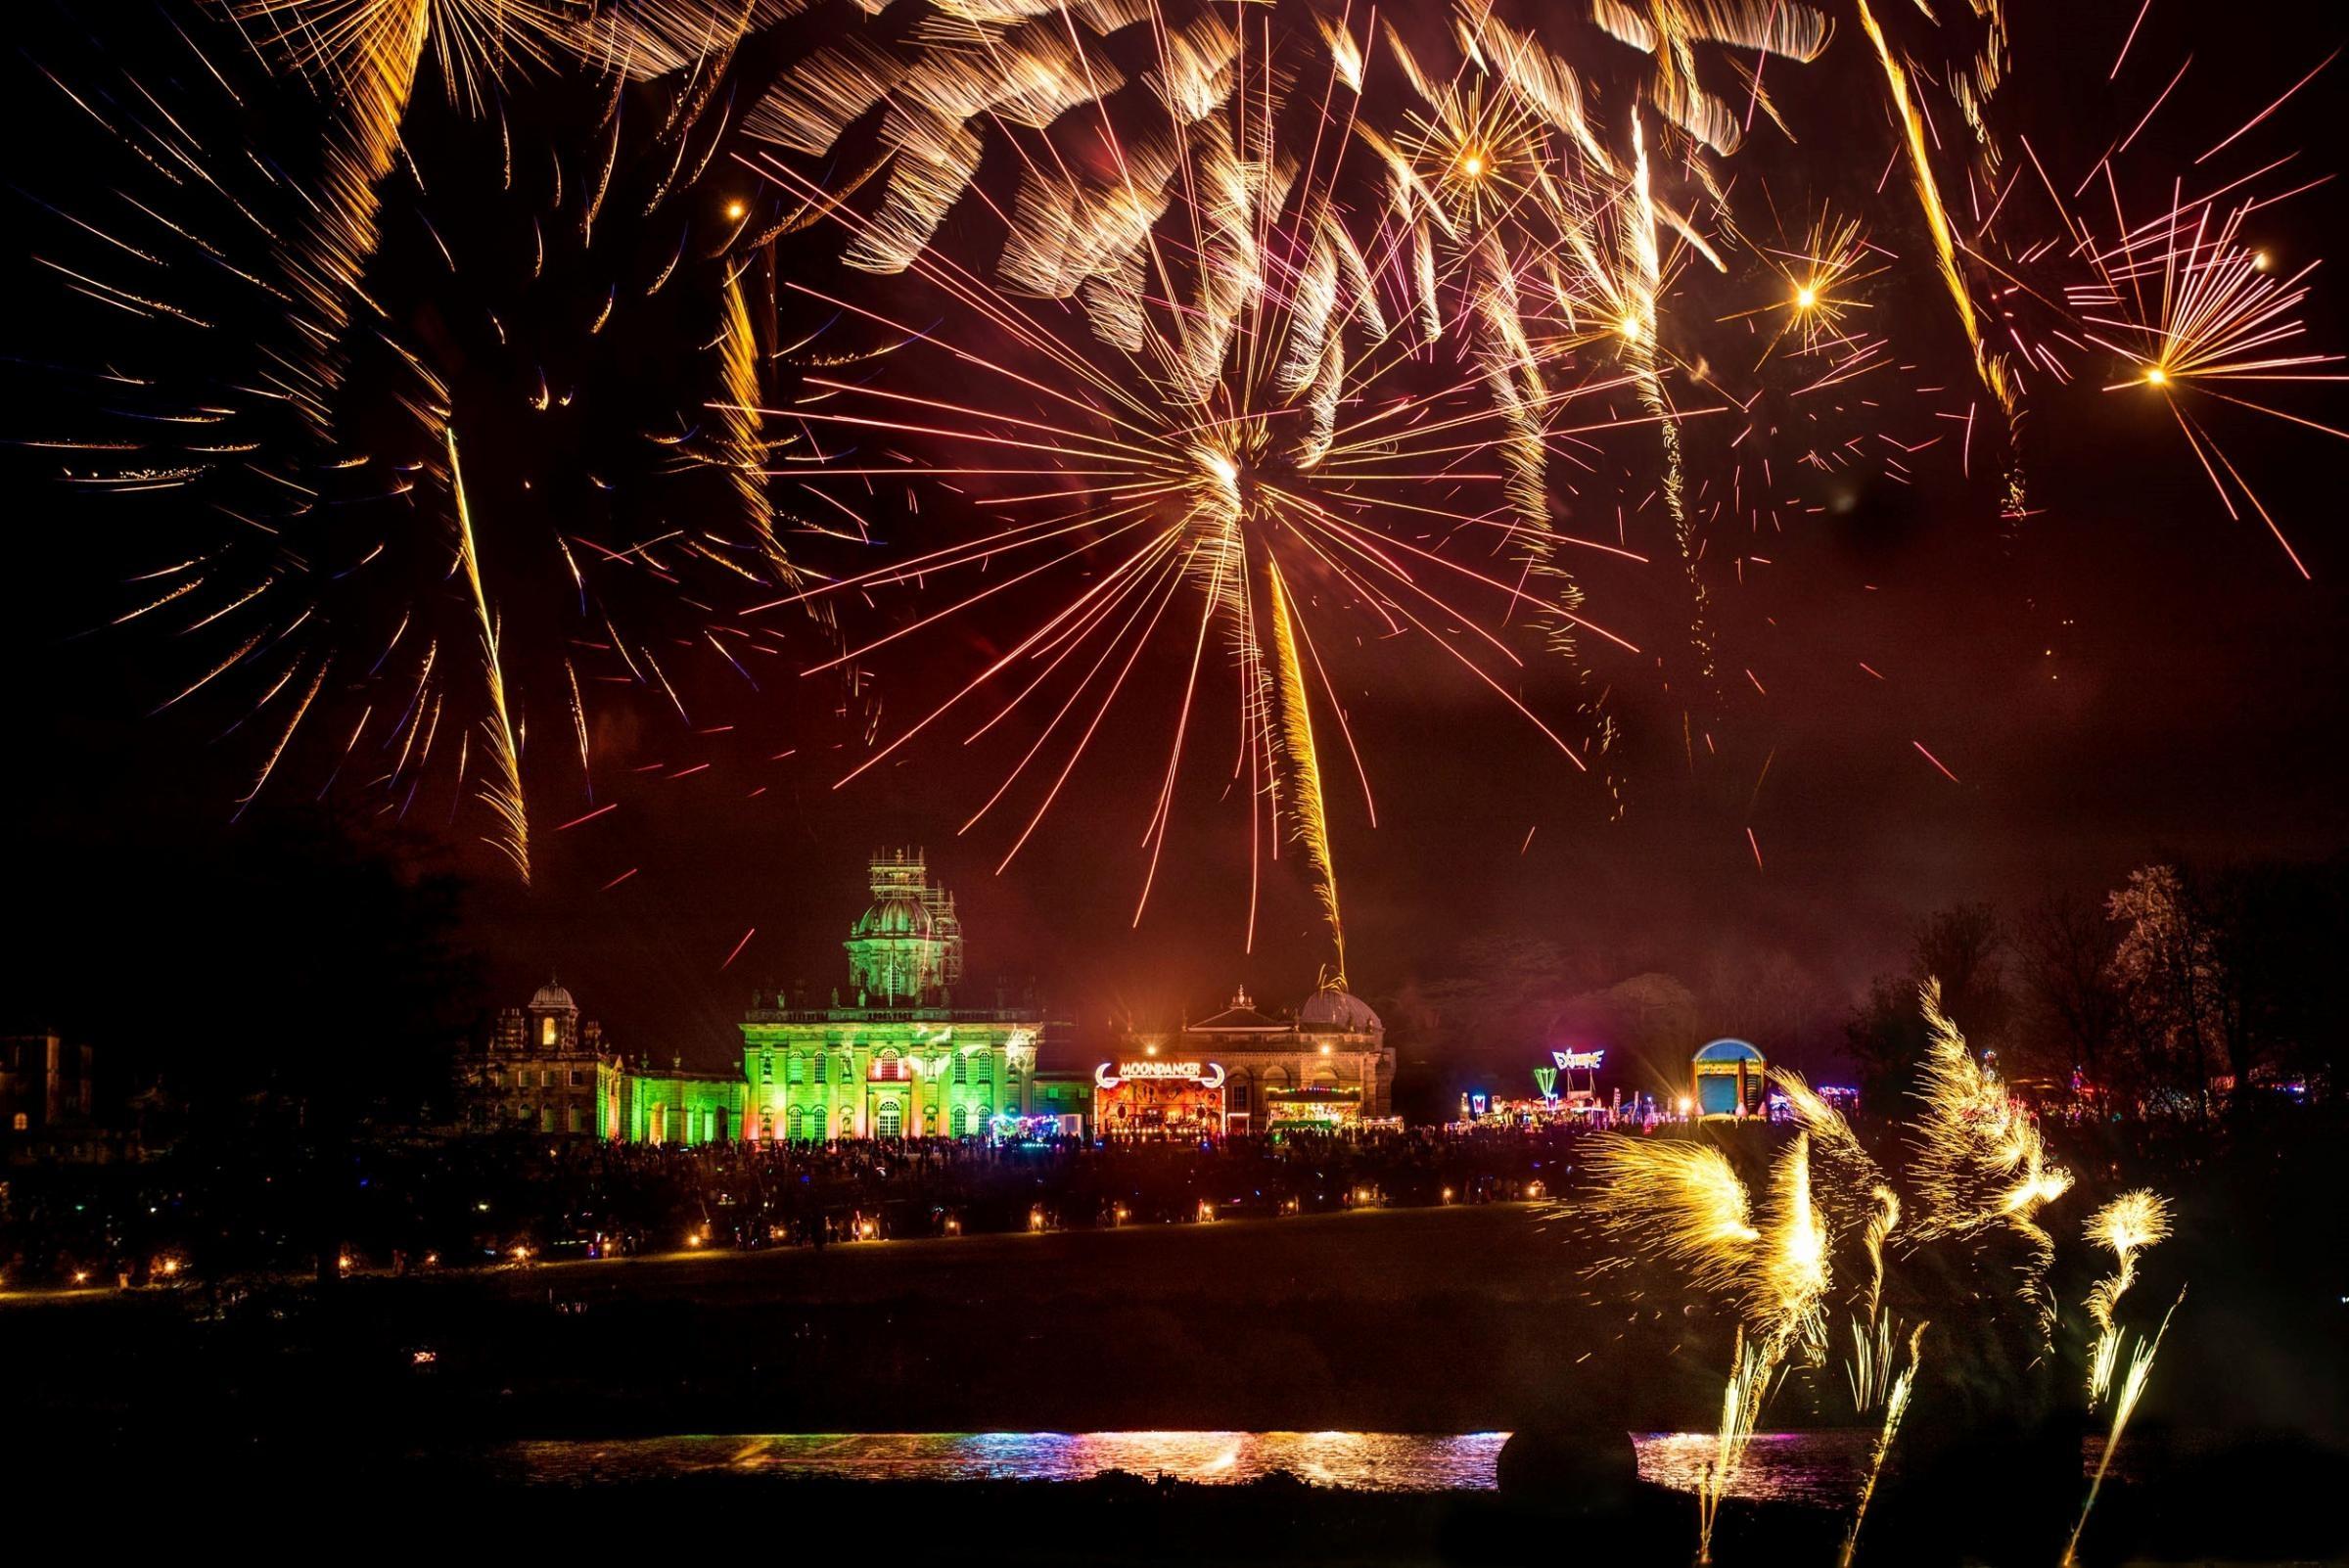 Bonfire Fireworks Events Yorkshire Wonders (9)